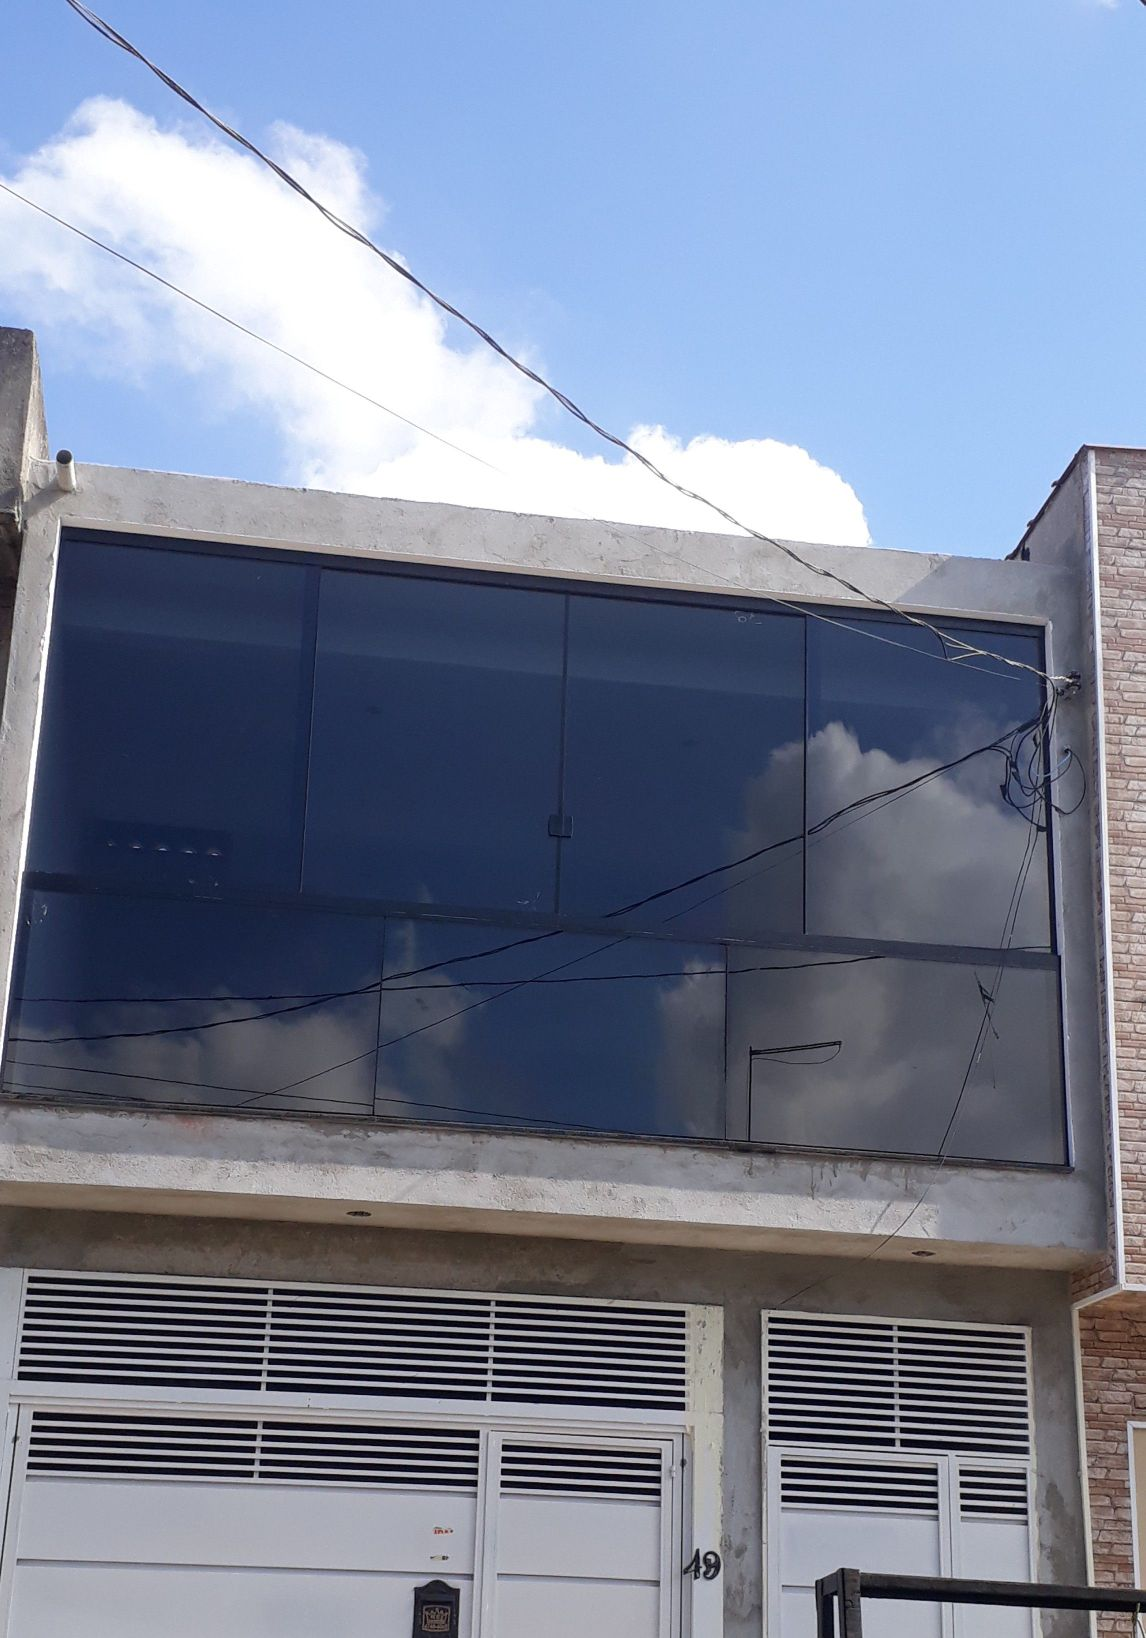 envidraçamento  janela  e guarda corpo conjugado